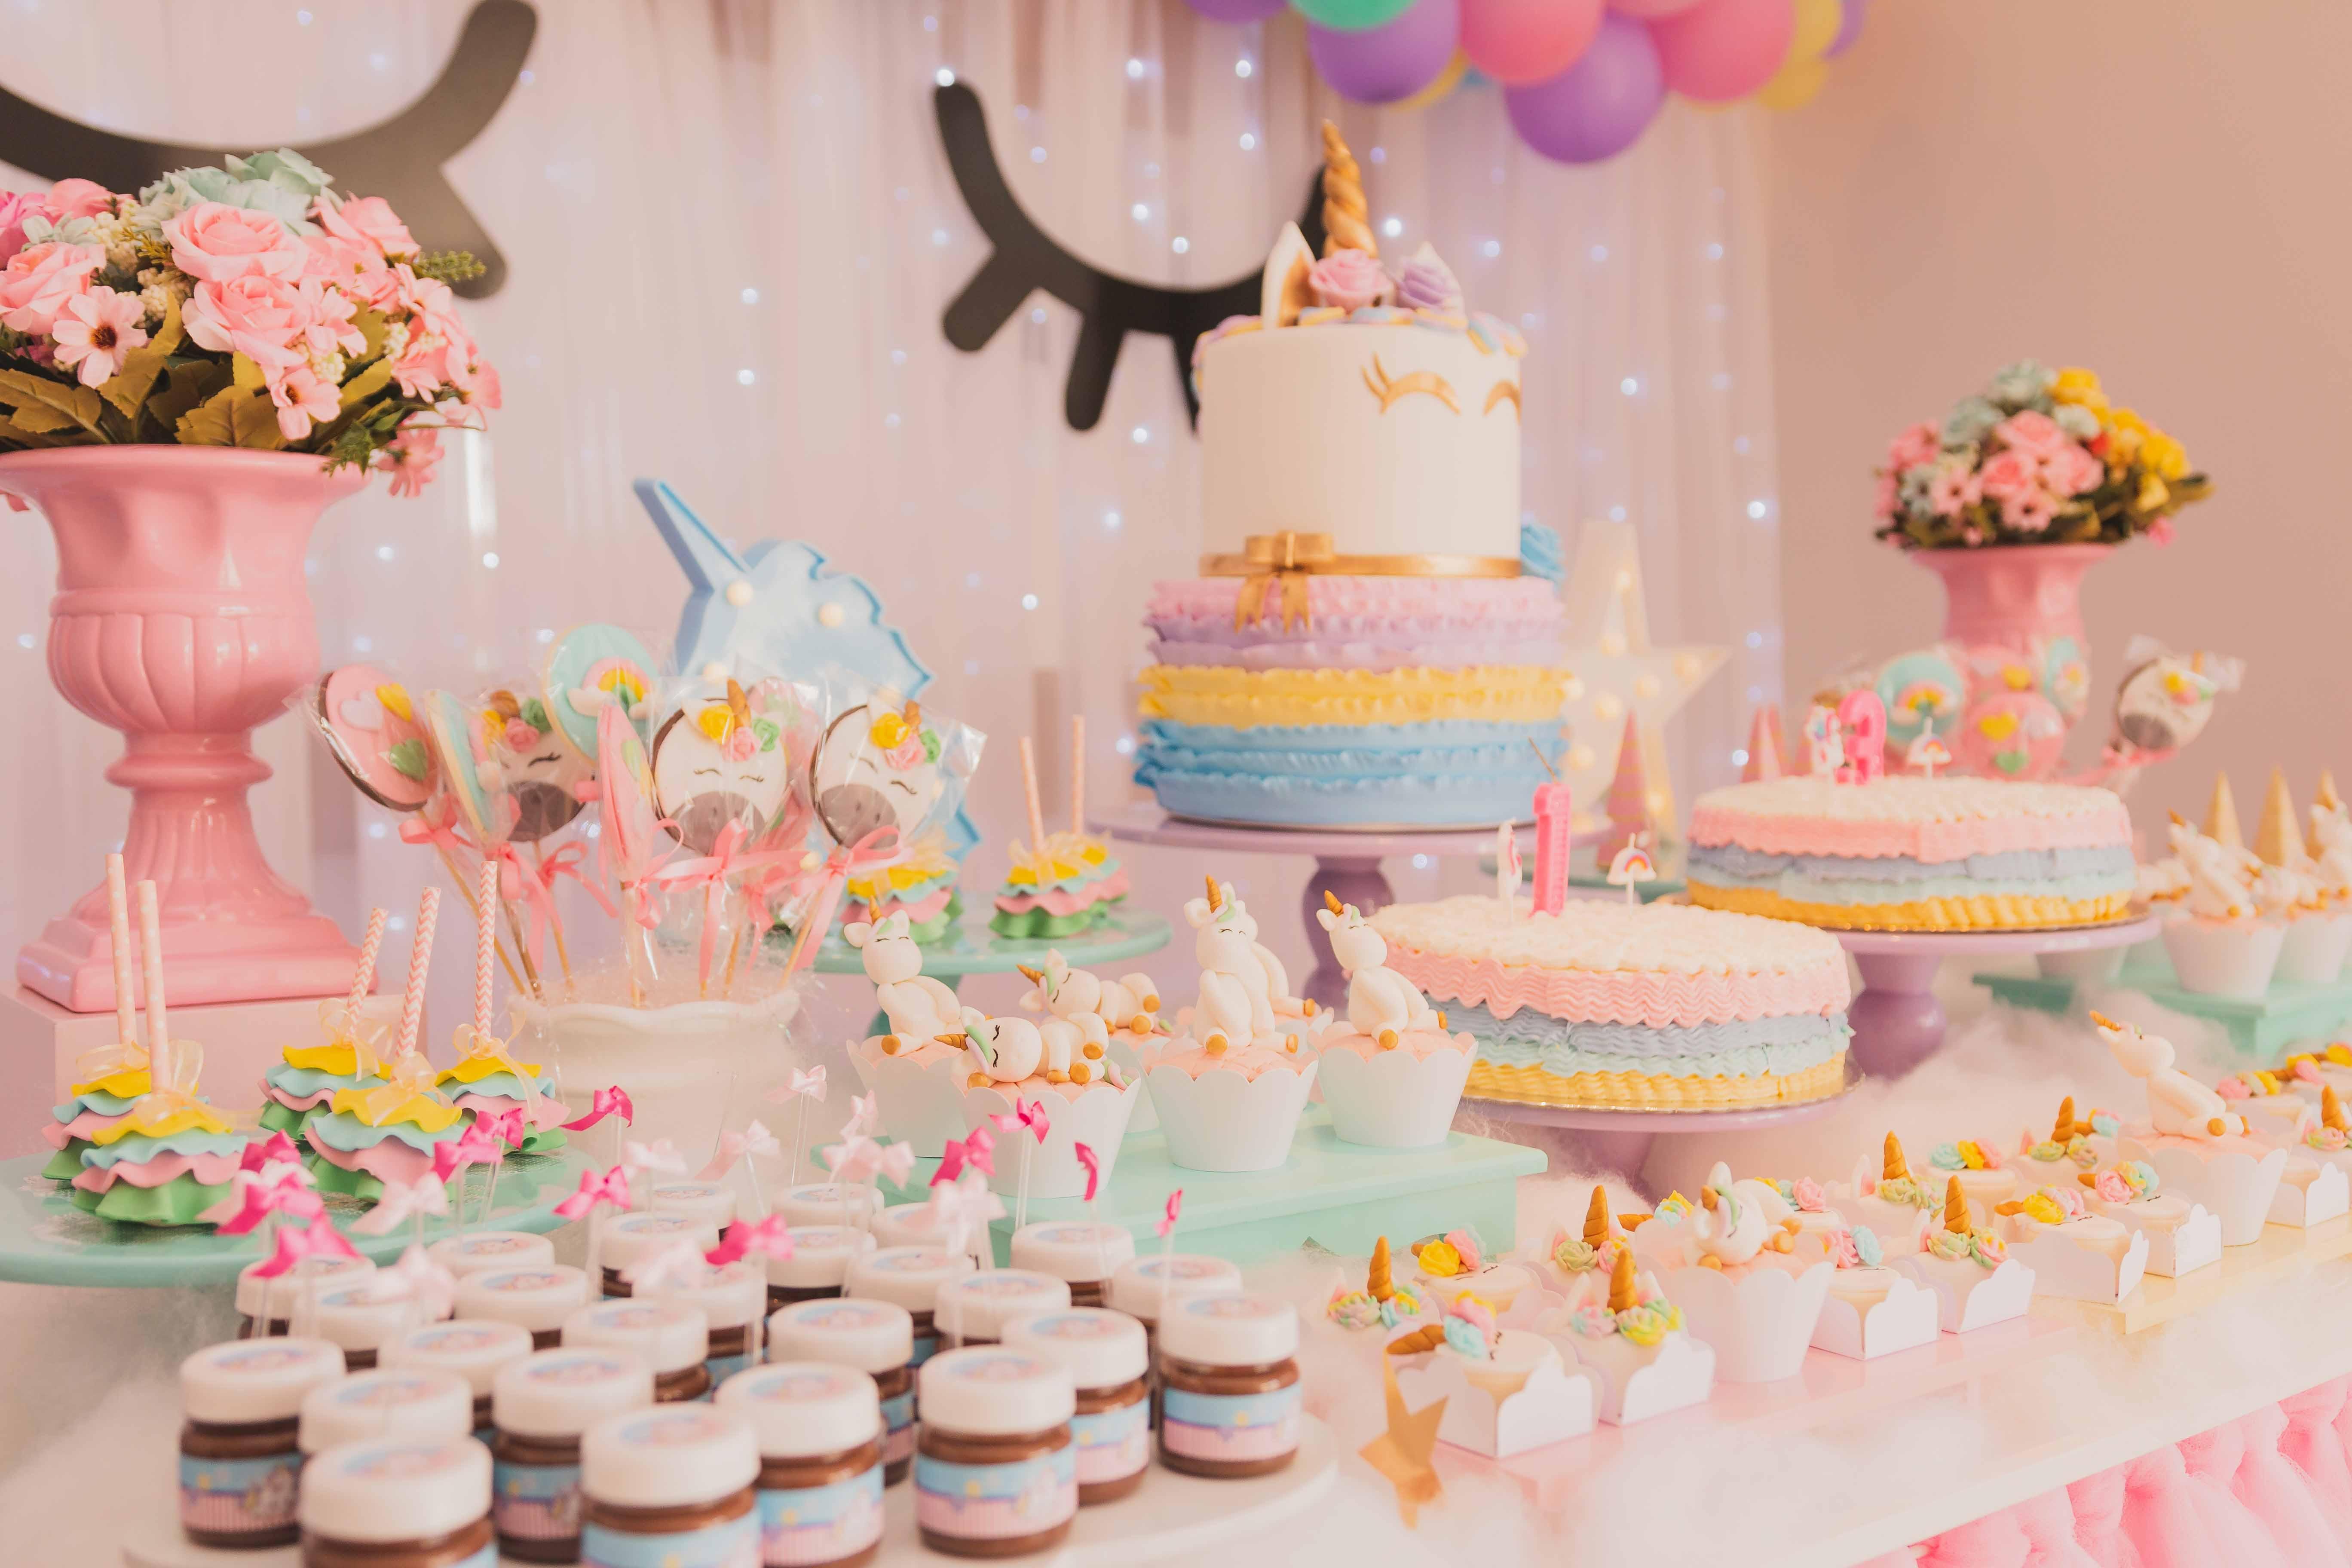 500 Amazing Birthday Cake Photos Pexels Free Stock Photos